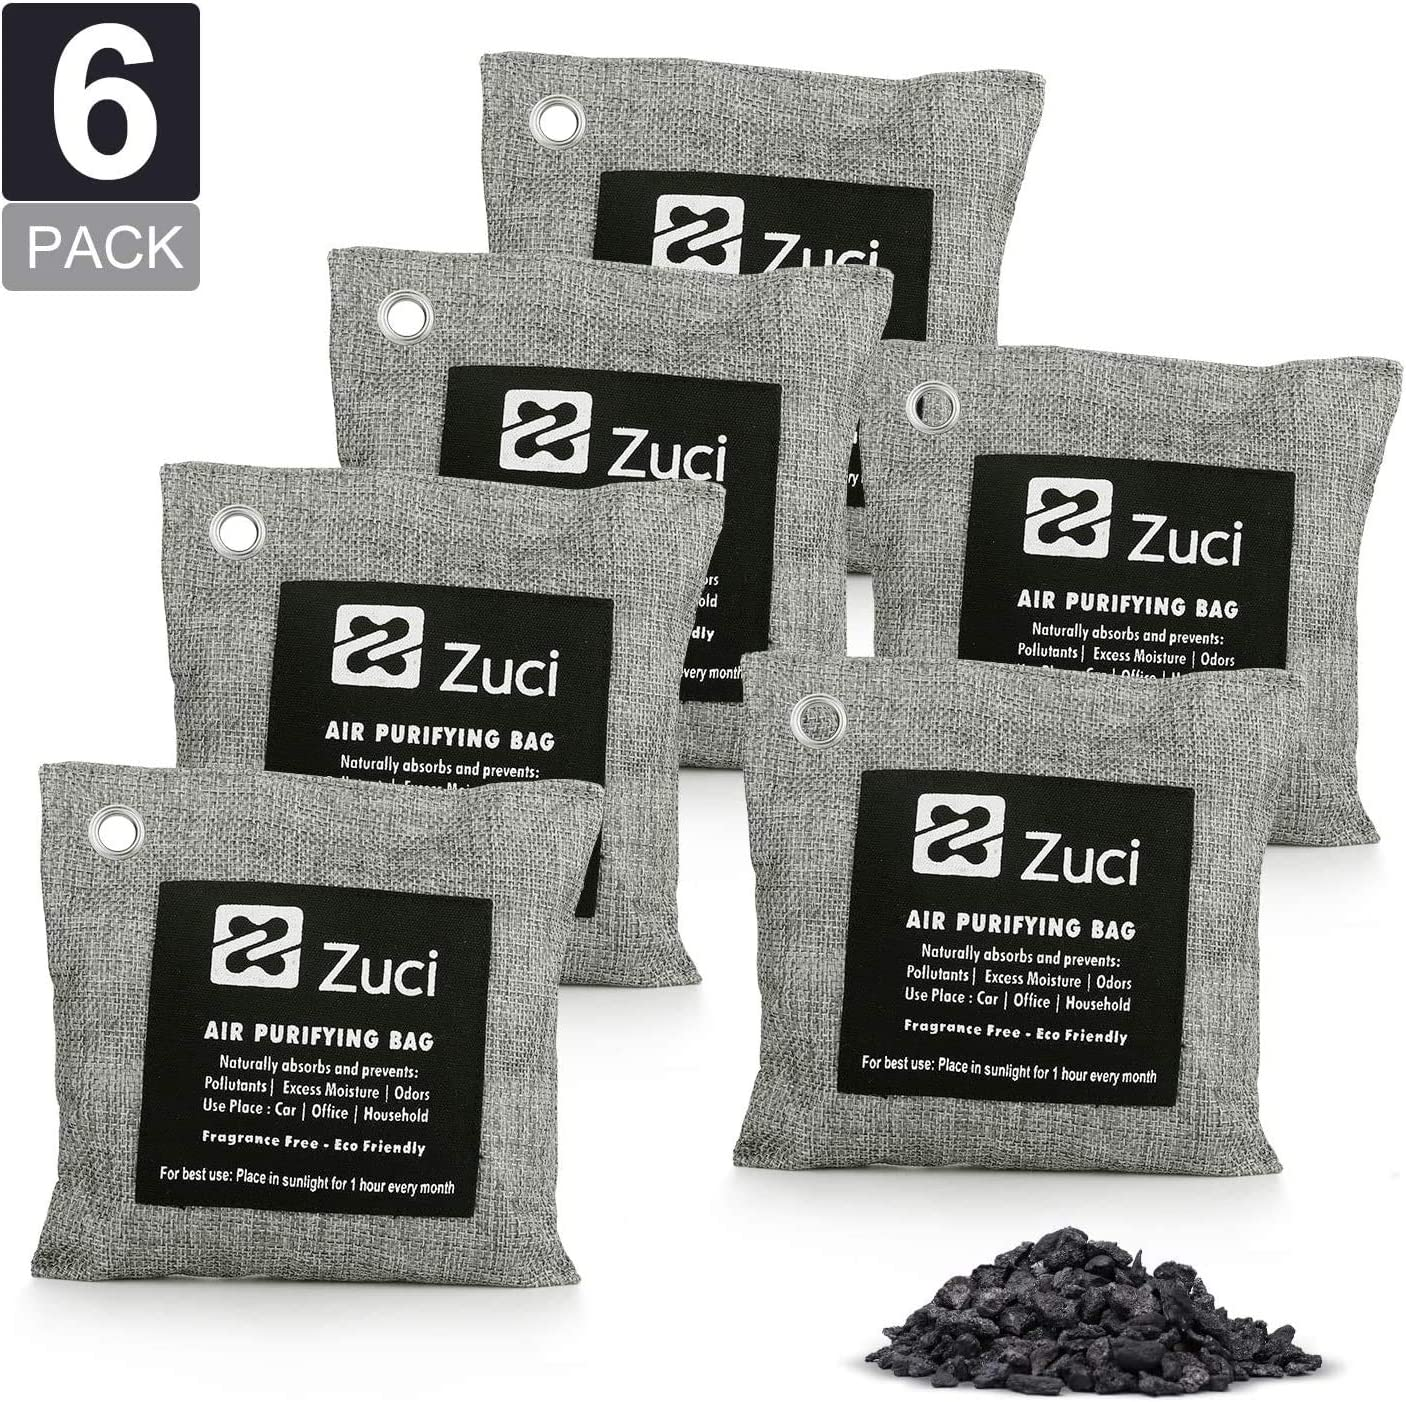 Pk 6 x 200 Grams, Bamboo Charcoal Air Freshener Bags, Naturally Activated Charcoal Bags, Odor Absorber, Car, Pets, Closet, Basement & Litter, Car Air Freshener